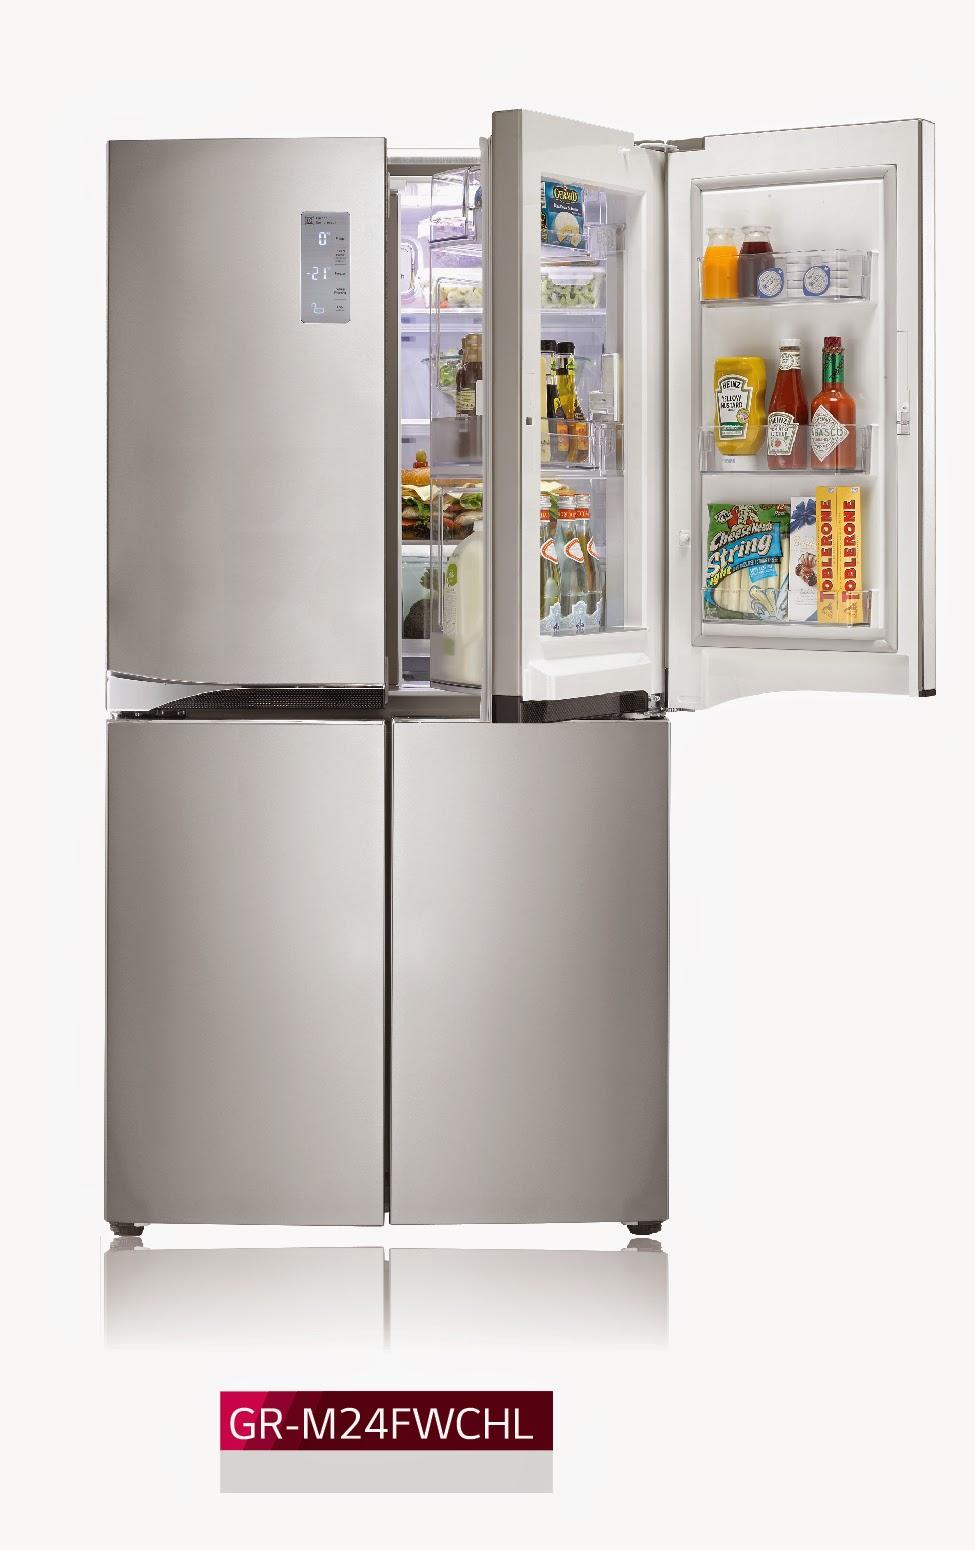 lg introduces new door in door refrigerator models pinoygadget. Black Bedroom Furniture Sets. Home Design Ideas